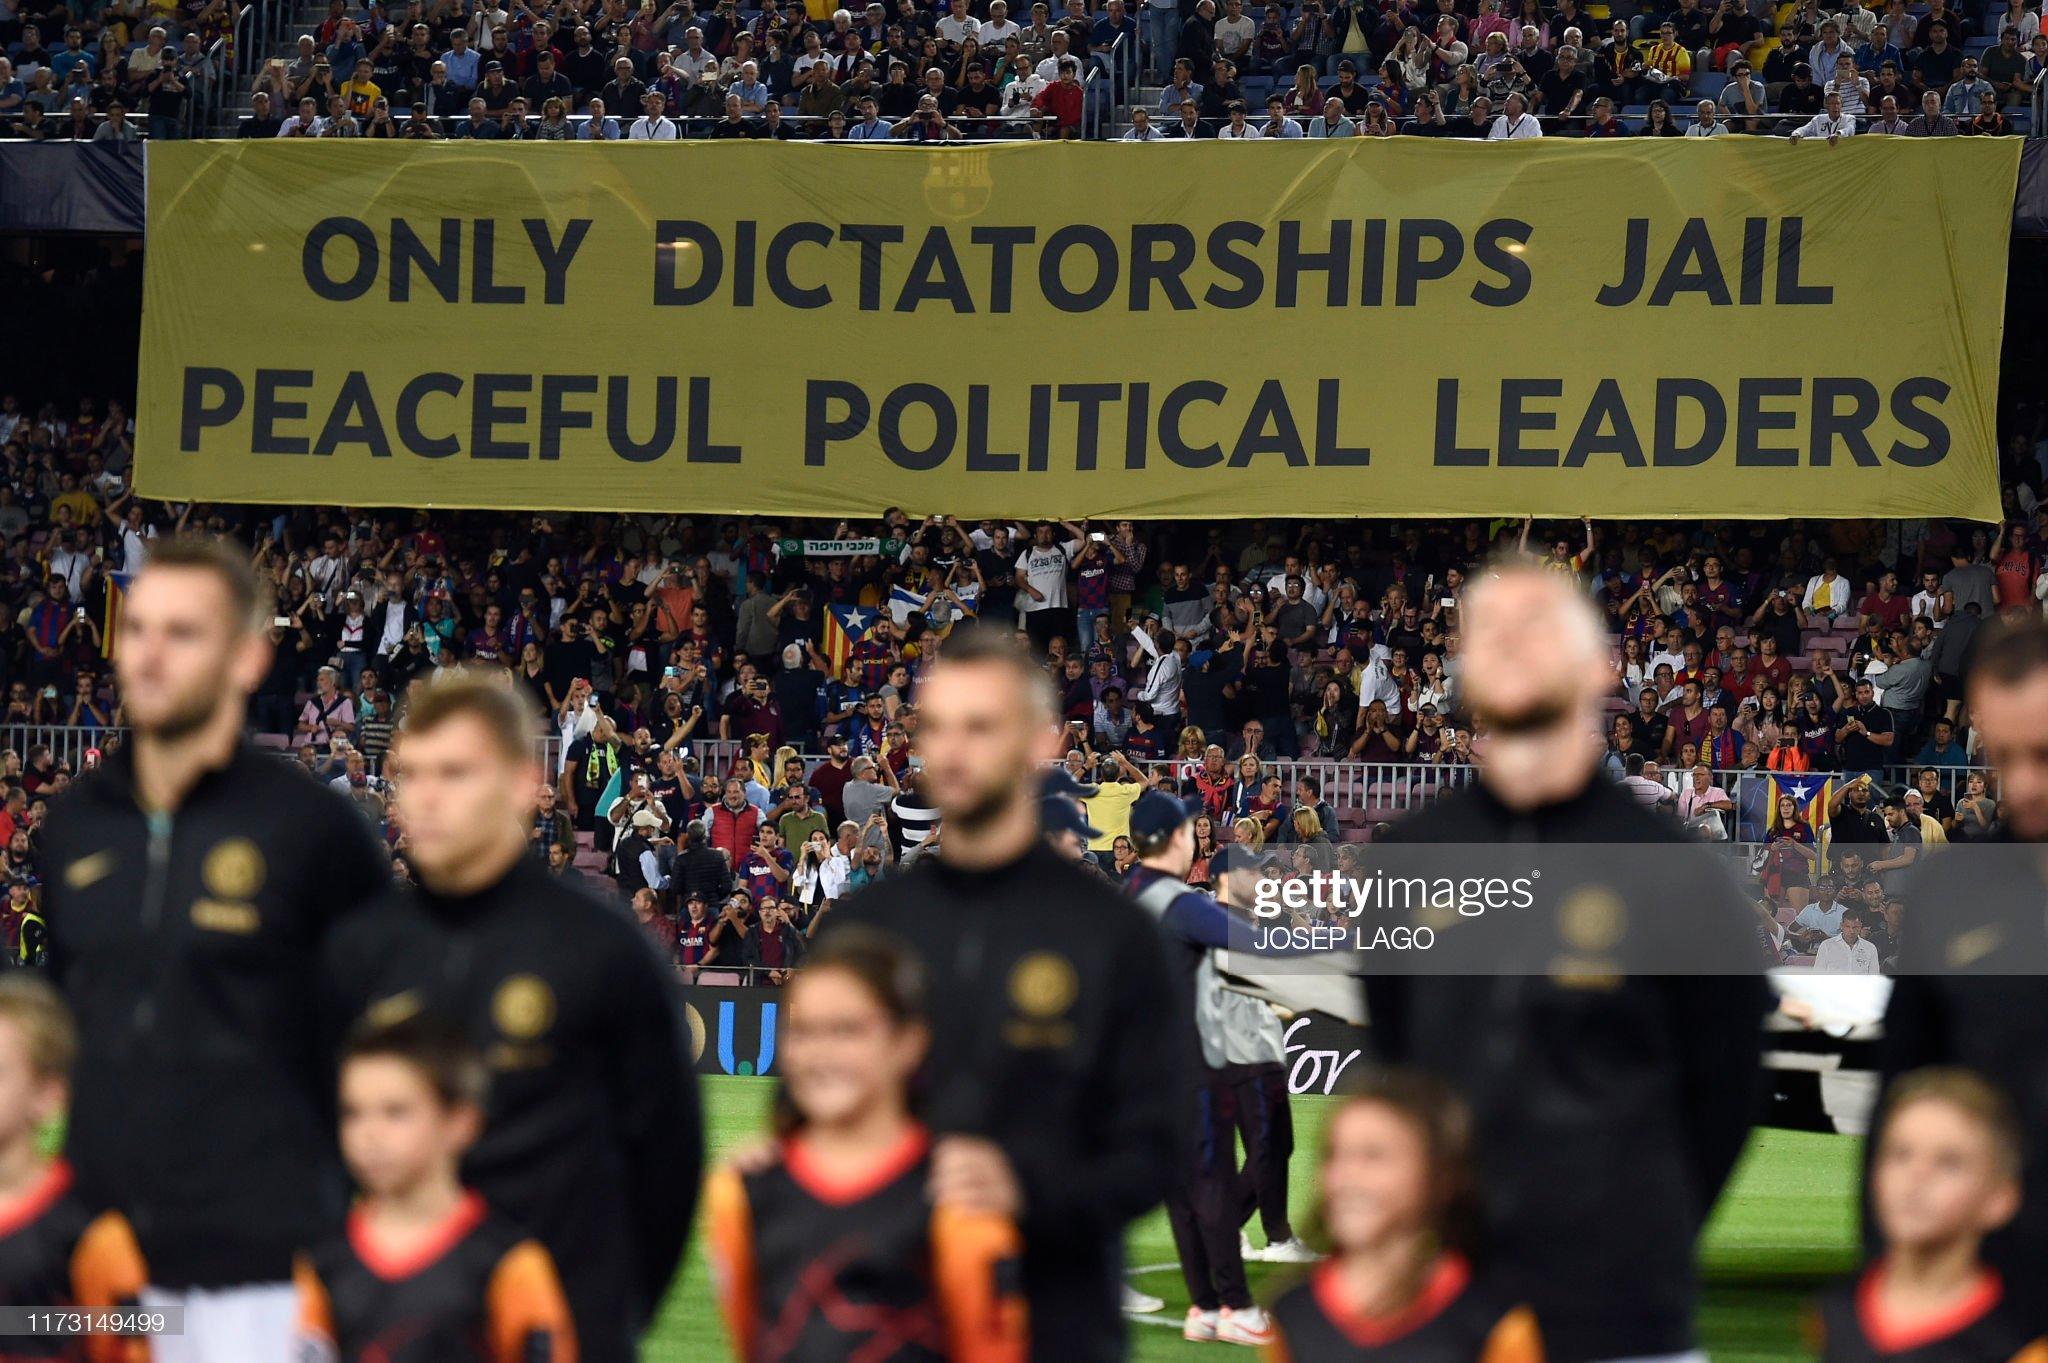 صور مباراة : برشلونة - إنتر 2-1 ( 02-10-2019 )  Political-banner-hangs-from-the-grandstands-during-the-uefa-champions-picture-id1173149499?s=2048x2048